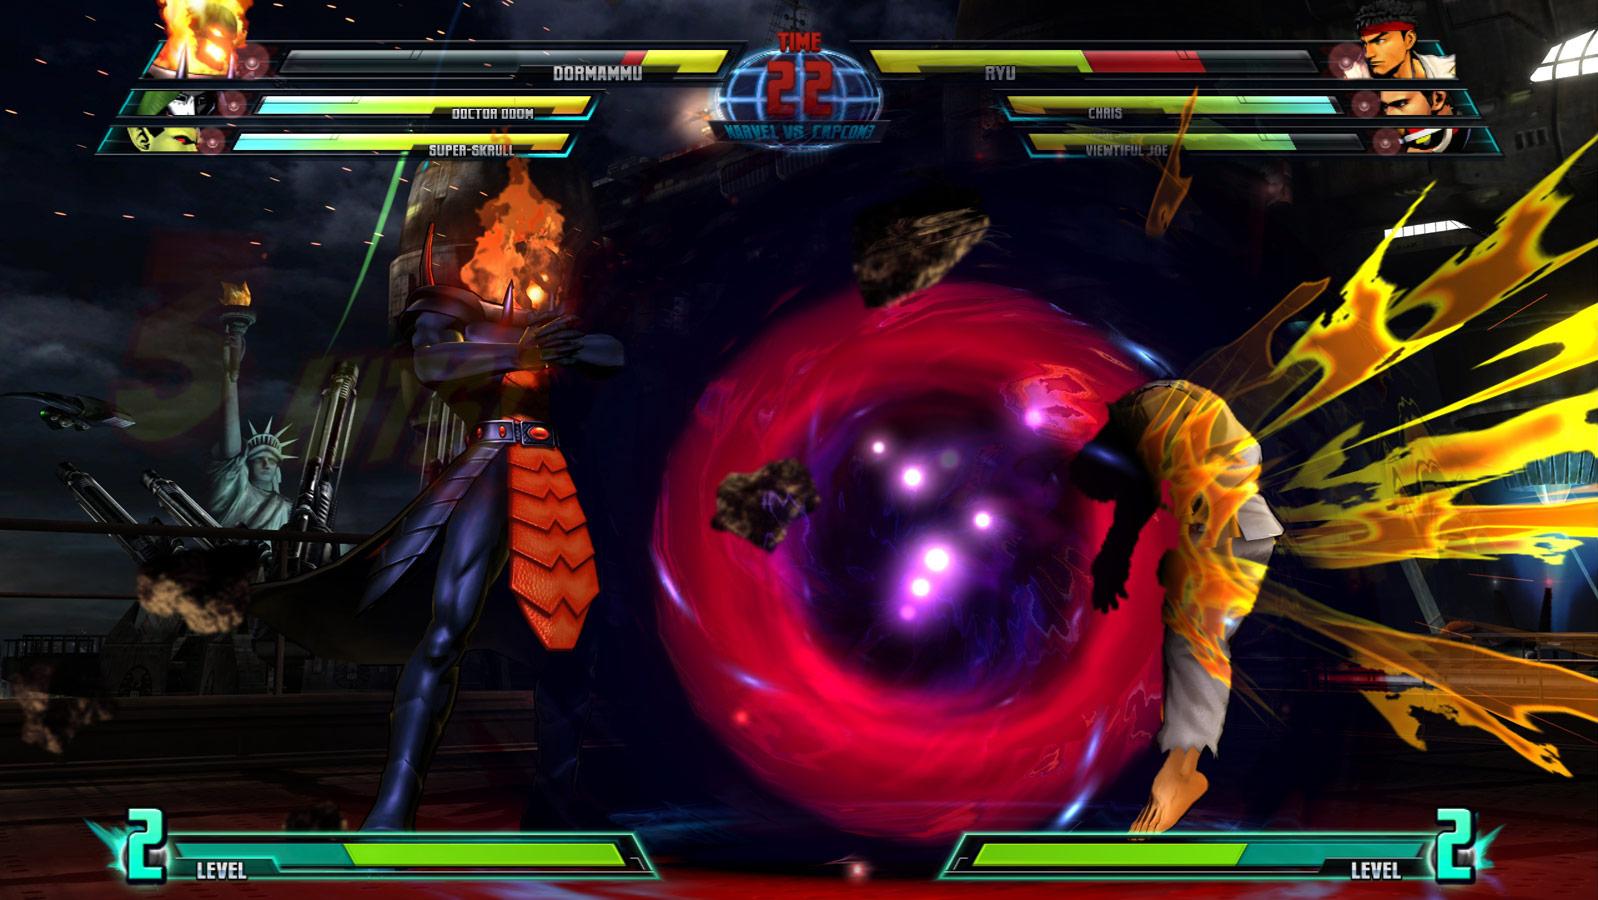 Marvel vs. Capcom 3 screen shot Aug. 18 image #3